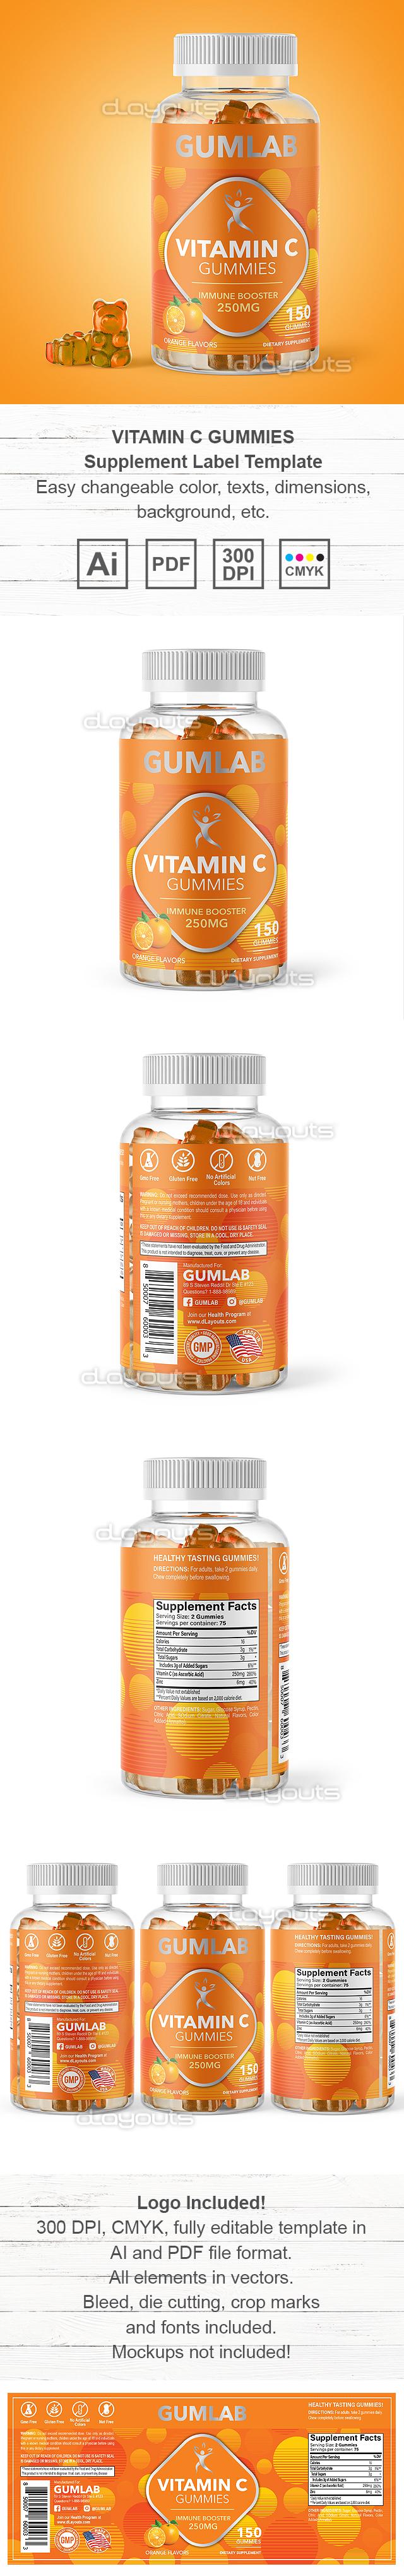 Vitamin C Gummies Supplement Label Template